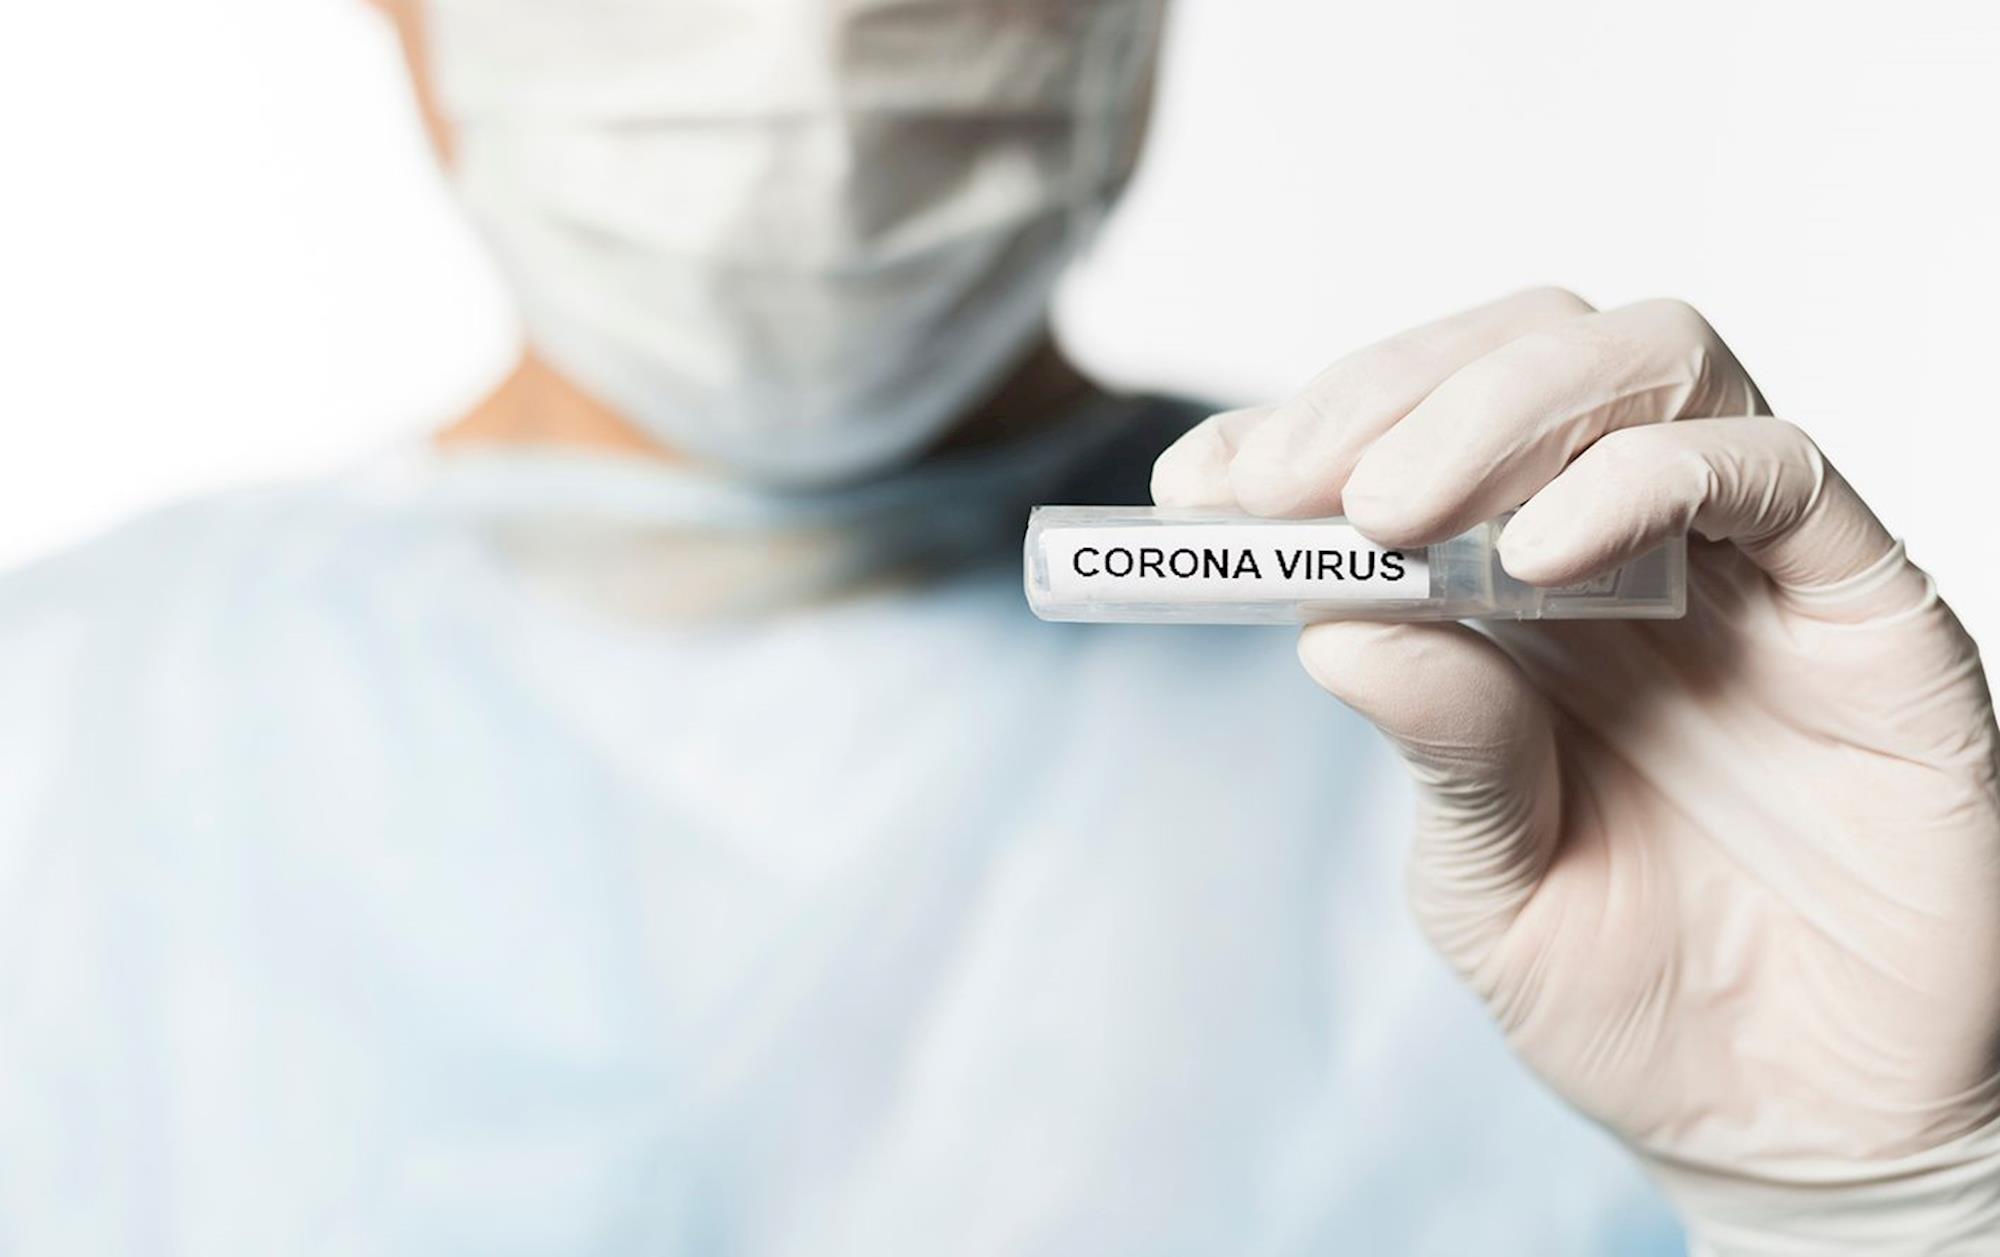 corona, vírus, sorocaba, balanço, saúde, morte, Freepik